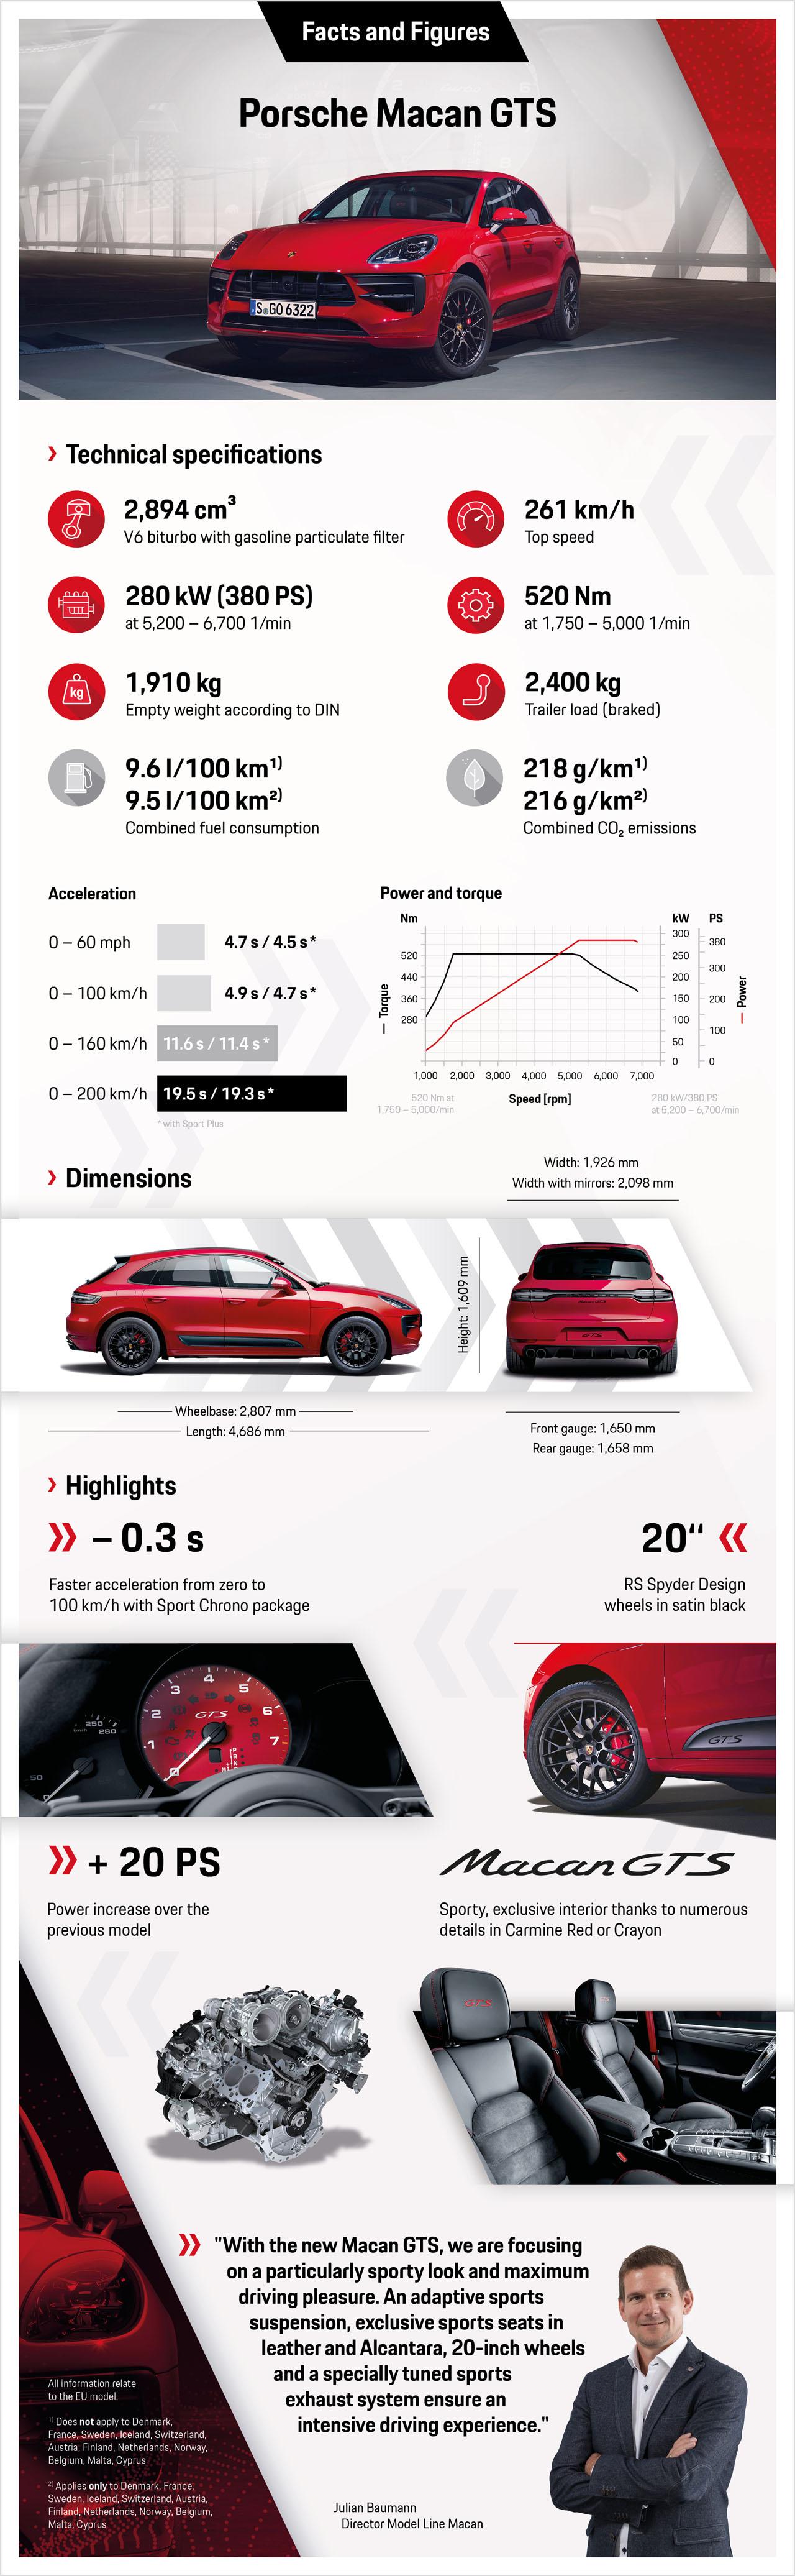 2021 Porsche Macan Redesign Turbo Gts And Specs >> New 375 Hp Porsche Macan Gts Hits 261km H The Car Magazine